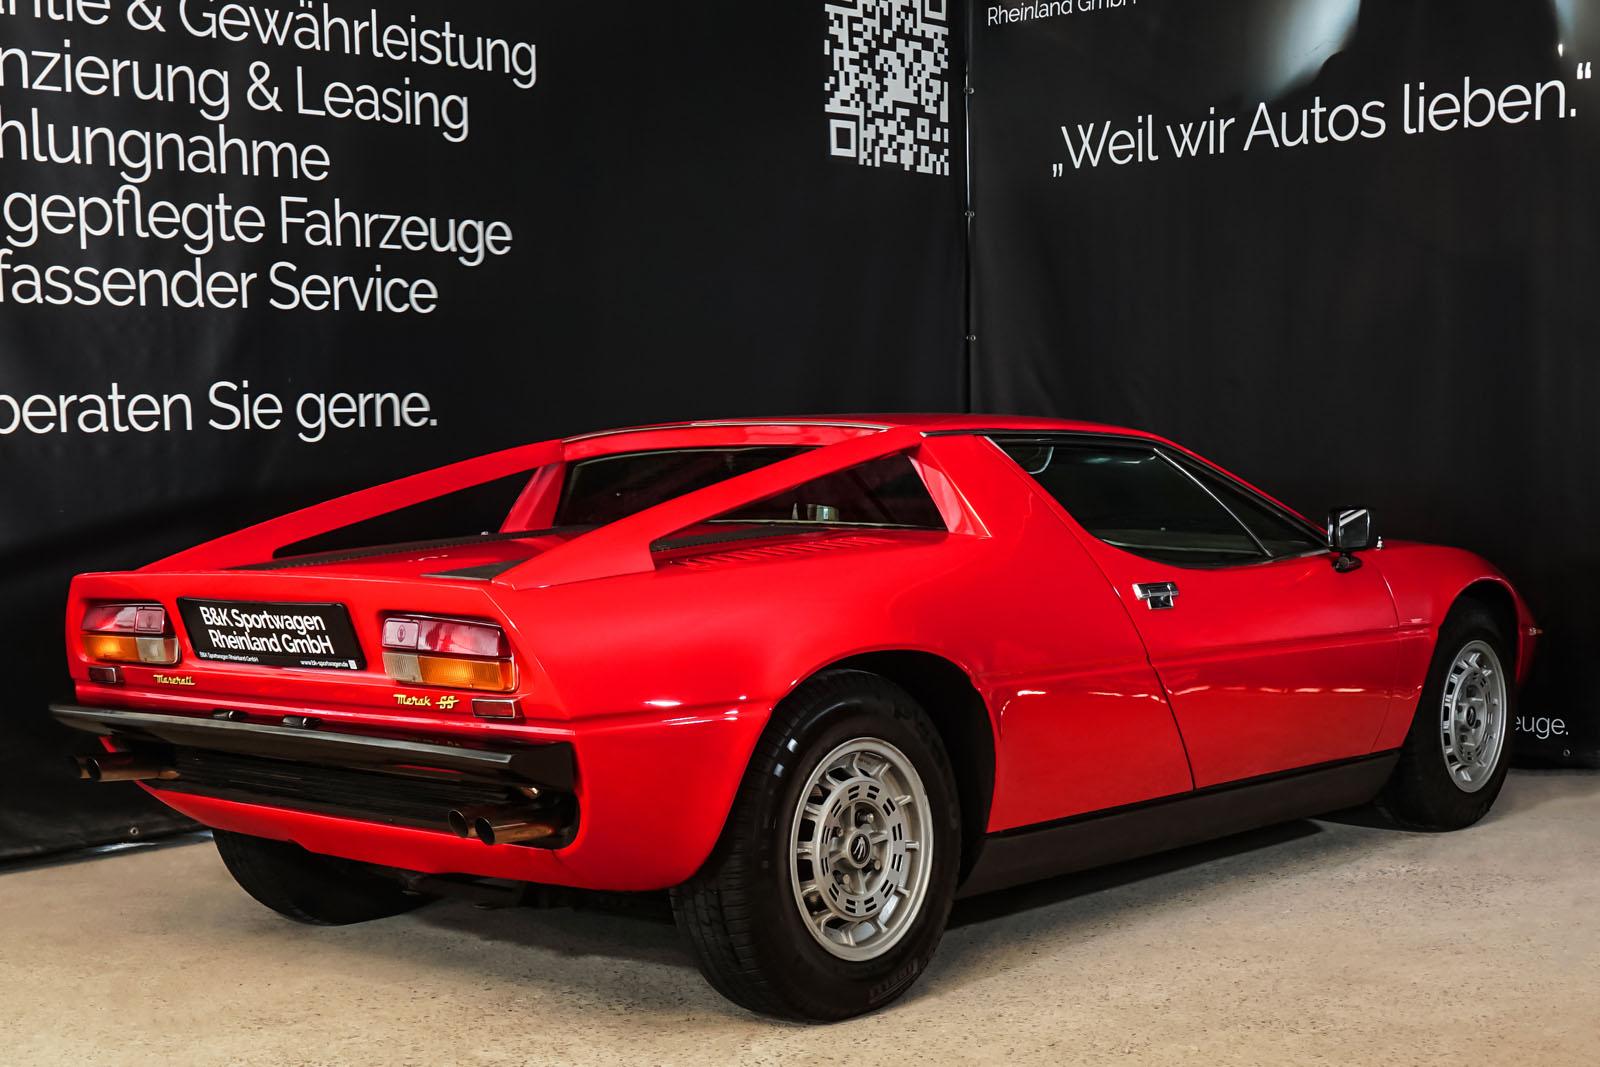 Maserati_Merak_Rot_Schwarz_MAS-4094_15_w